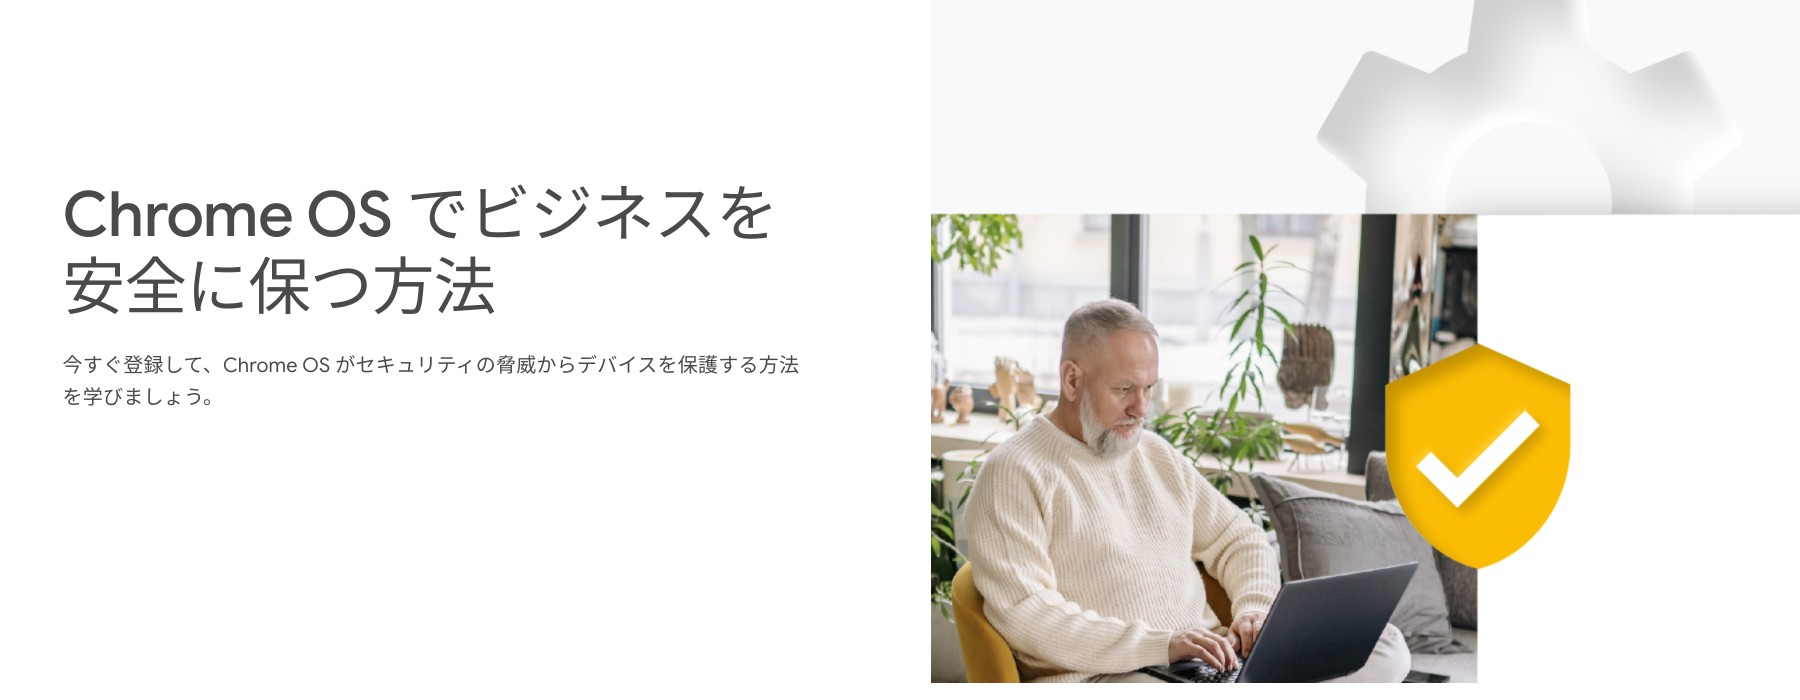 [Chrome] Chrome OS でビジネスを安全に保つ方法